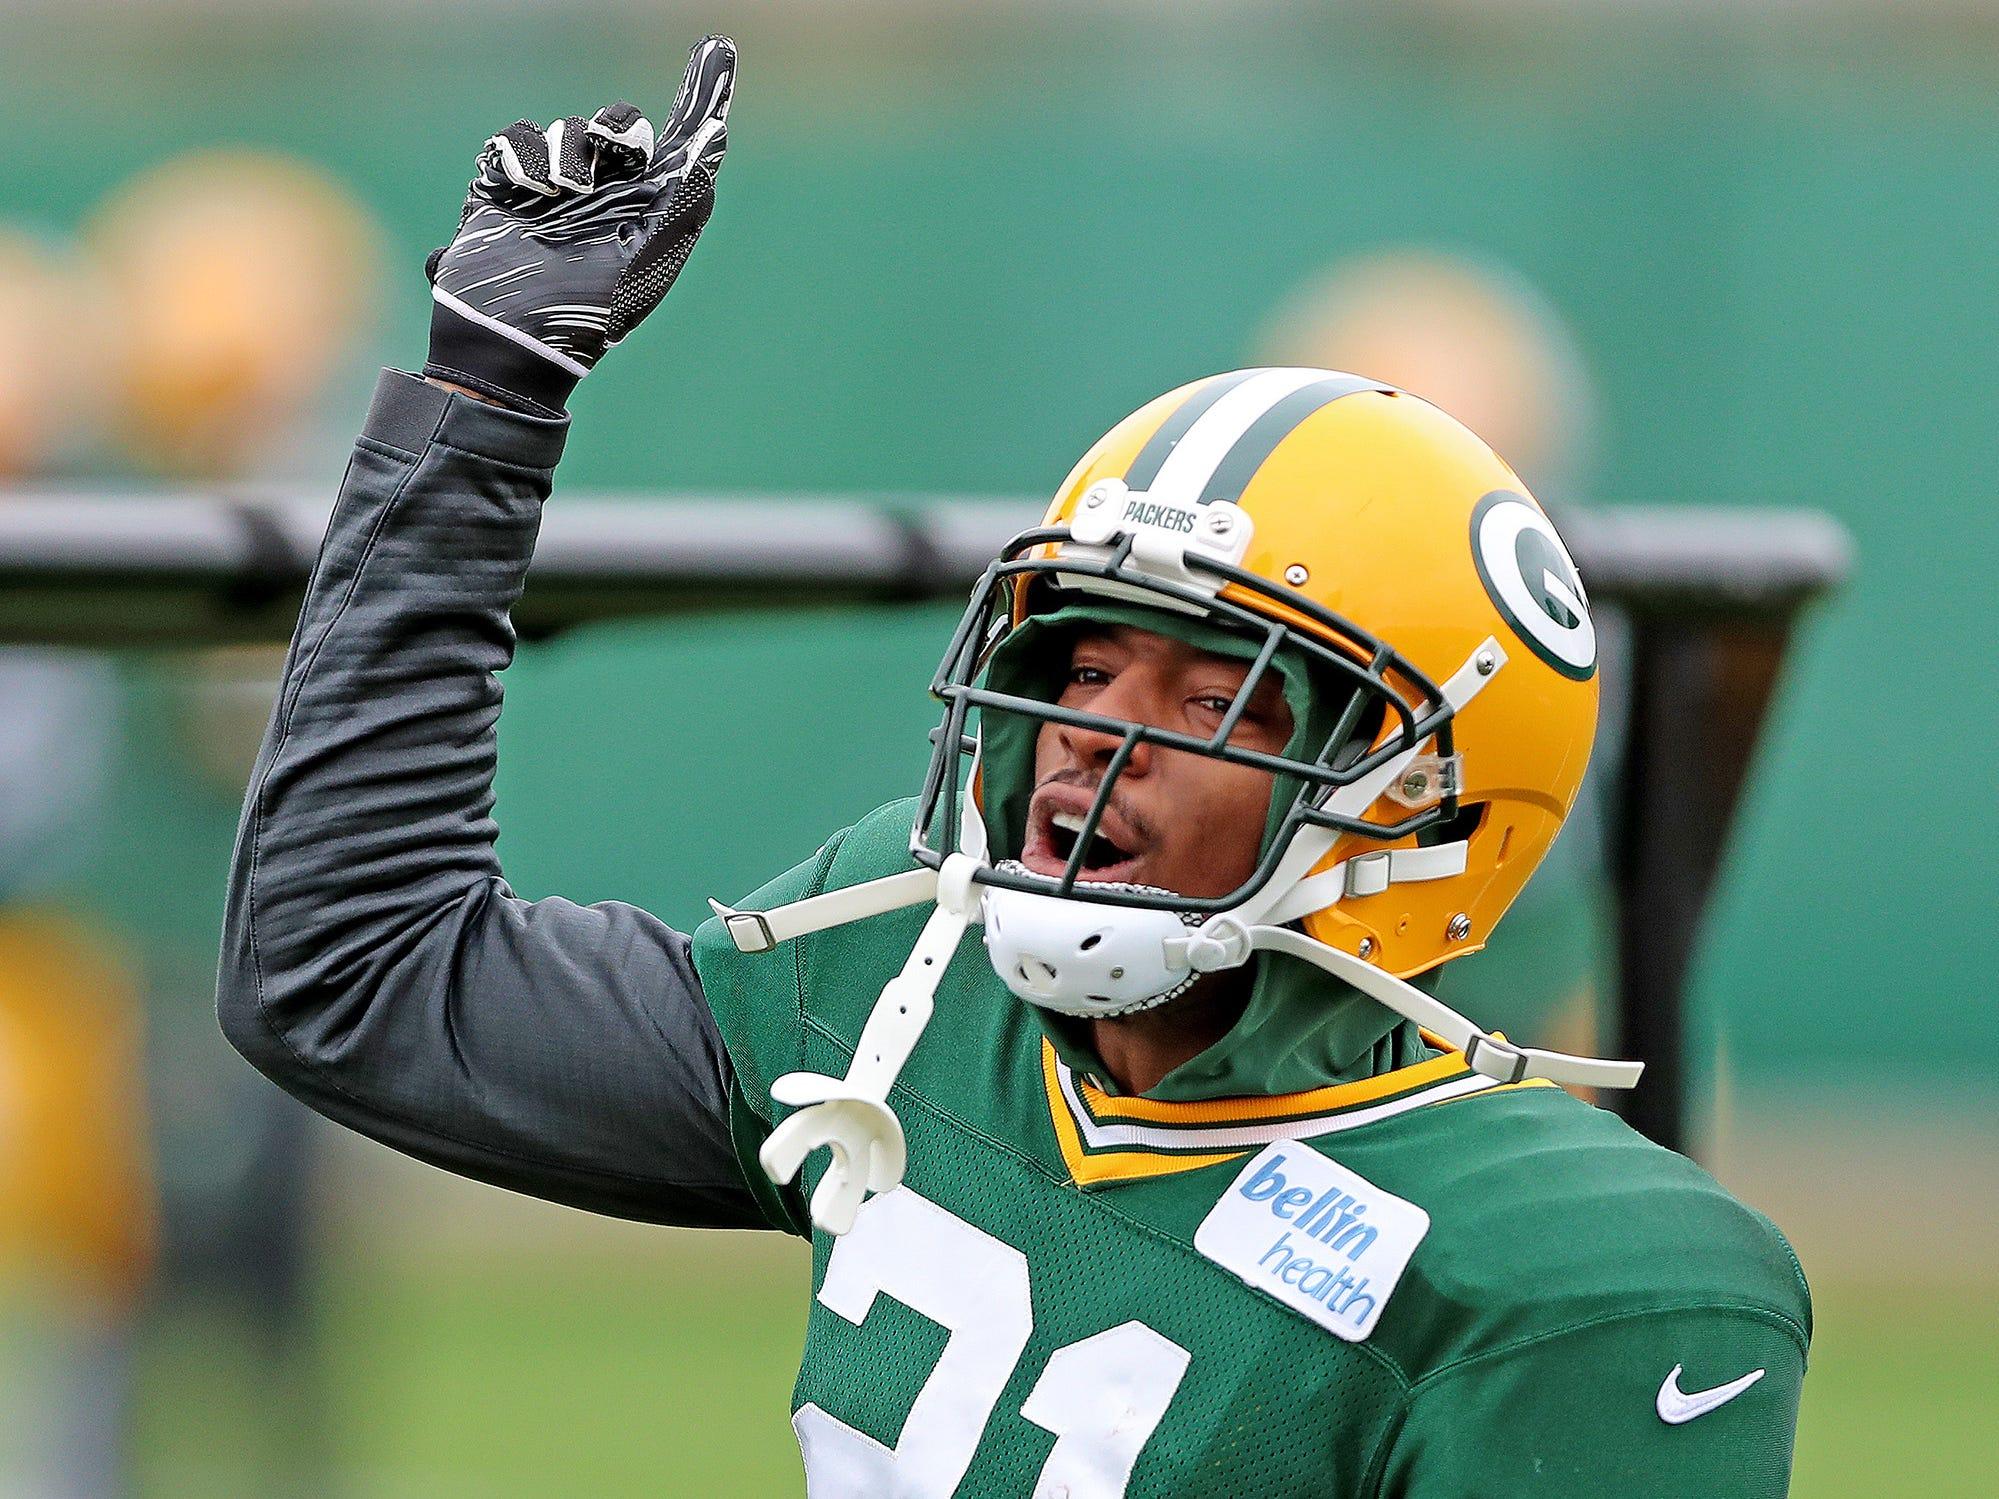 Green Bay Packers defensive back Ha Ha Clinton-Dix (21) has fun between reps during practice on Clarke Hinkle Field Friday, October 12, 2018 in Ashwaubenon, Wis.